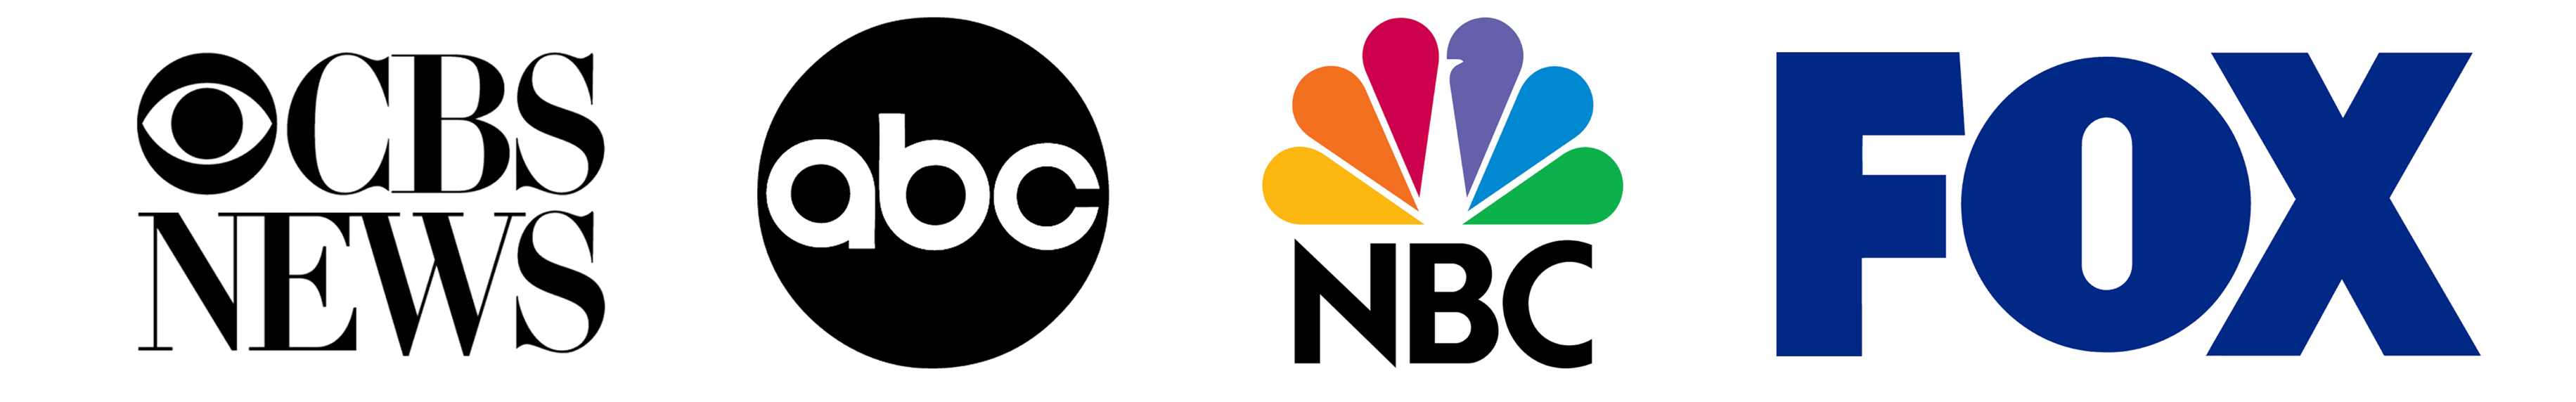 abc-cbs-nbc-fox-color